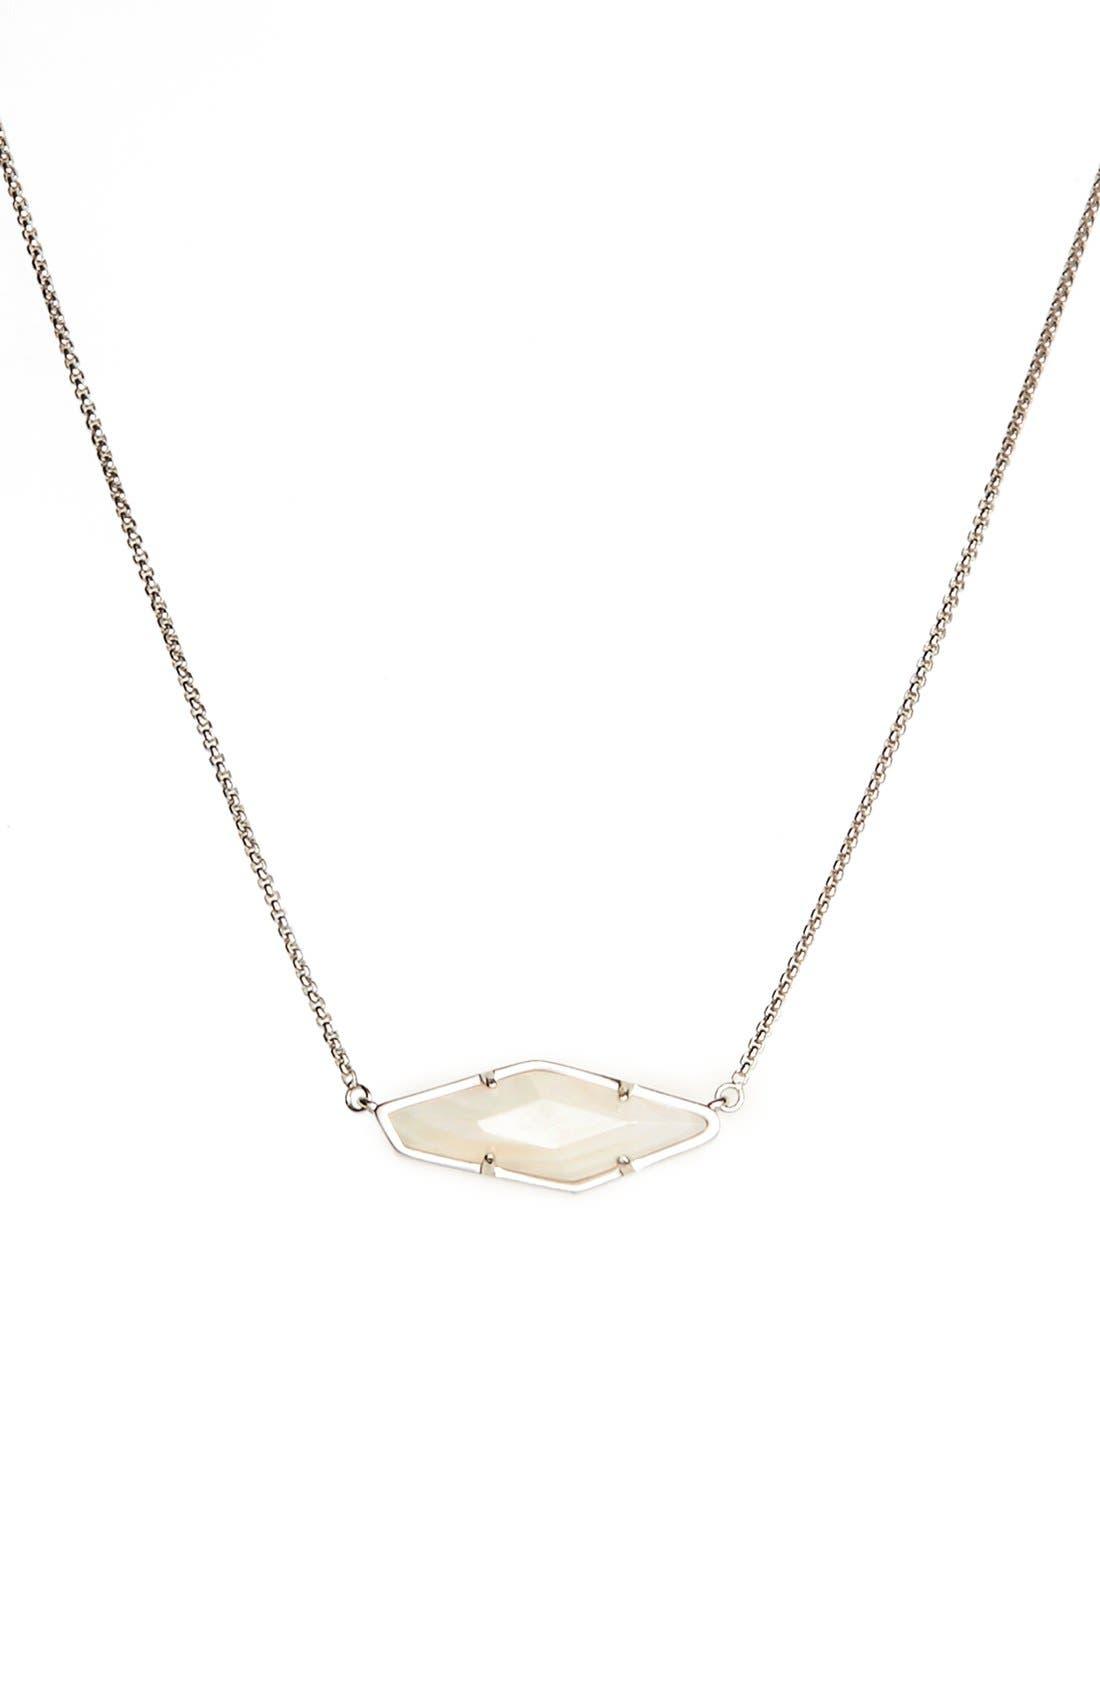 Main Image - Kendra Scott 'Beth' Pendant Necklace